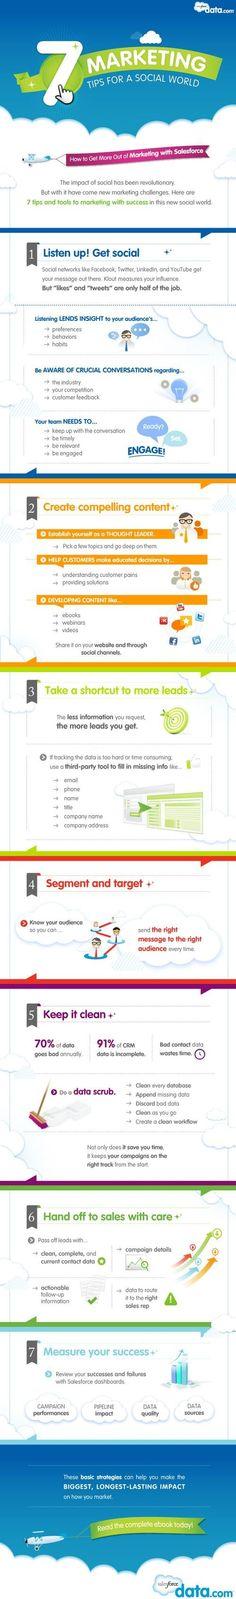 social marketing salesforce